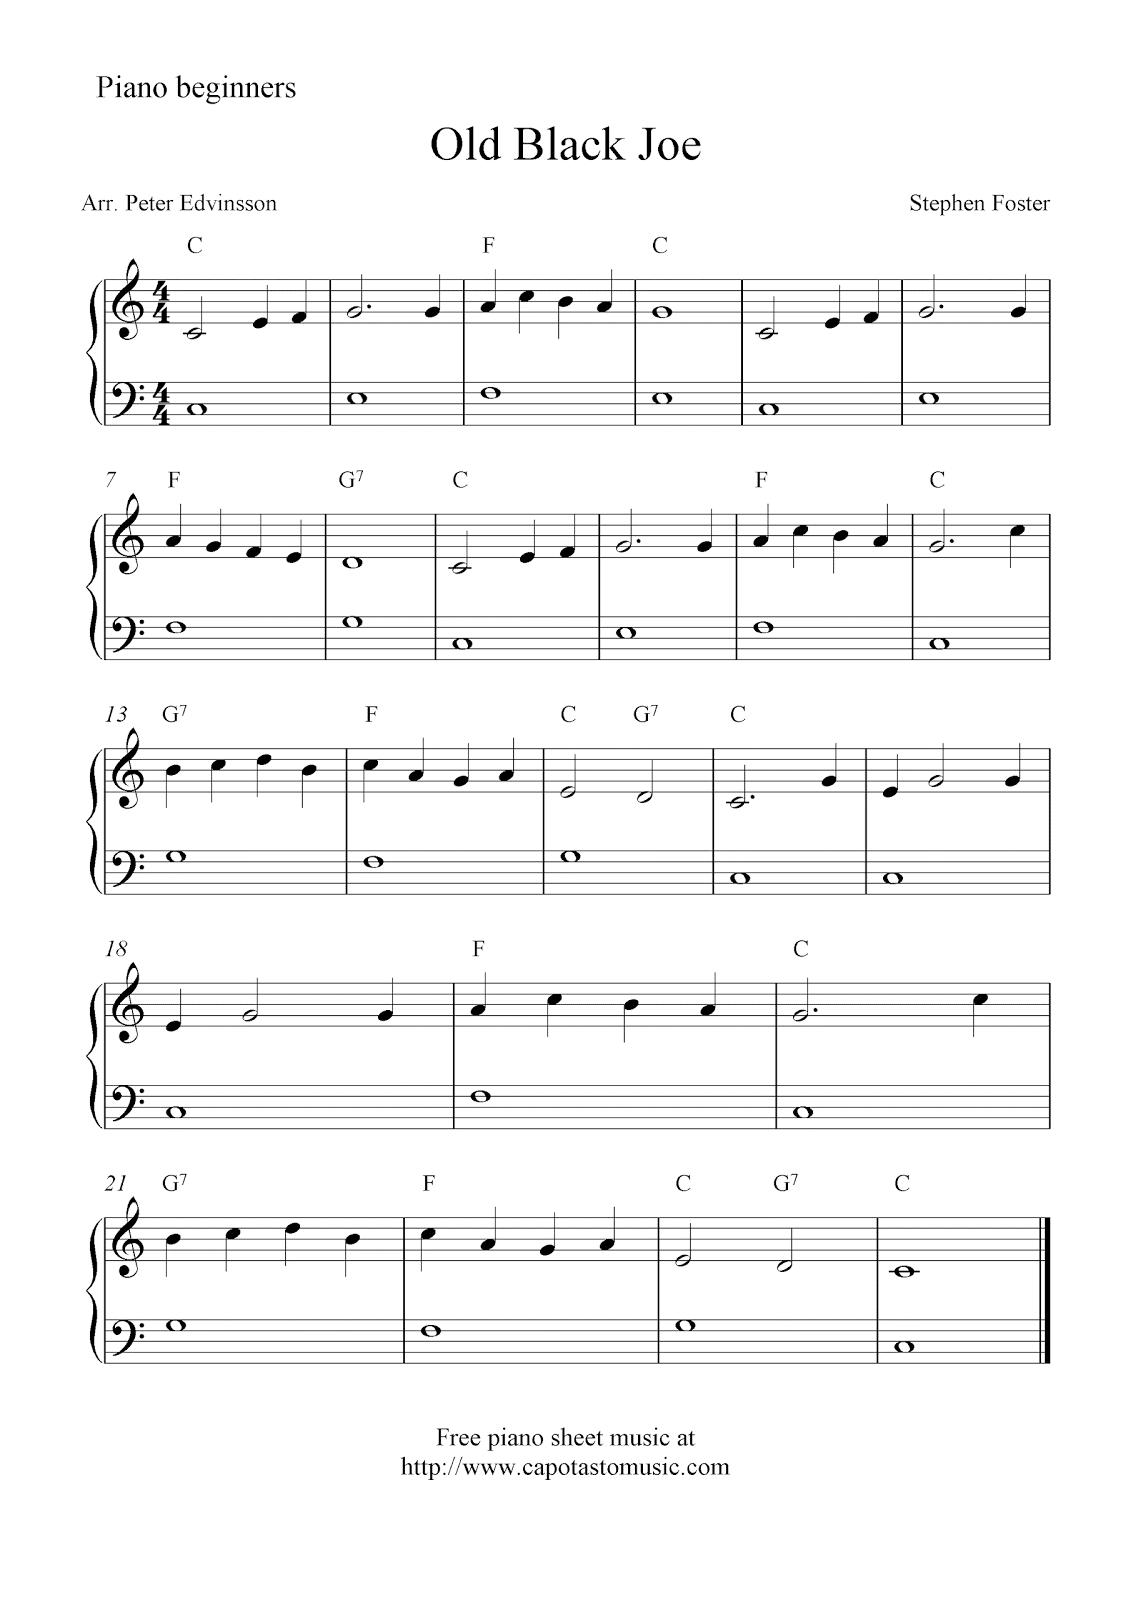 Free Printable Piano Sheet Music Pop Songs Beginners